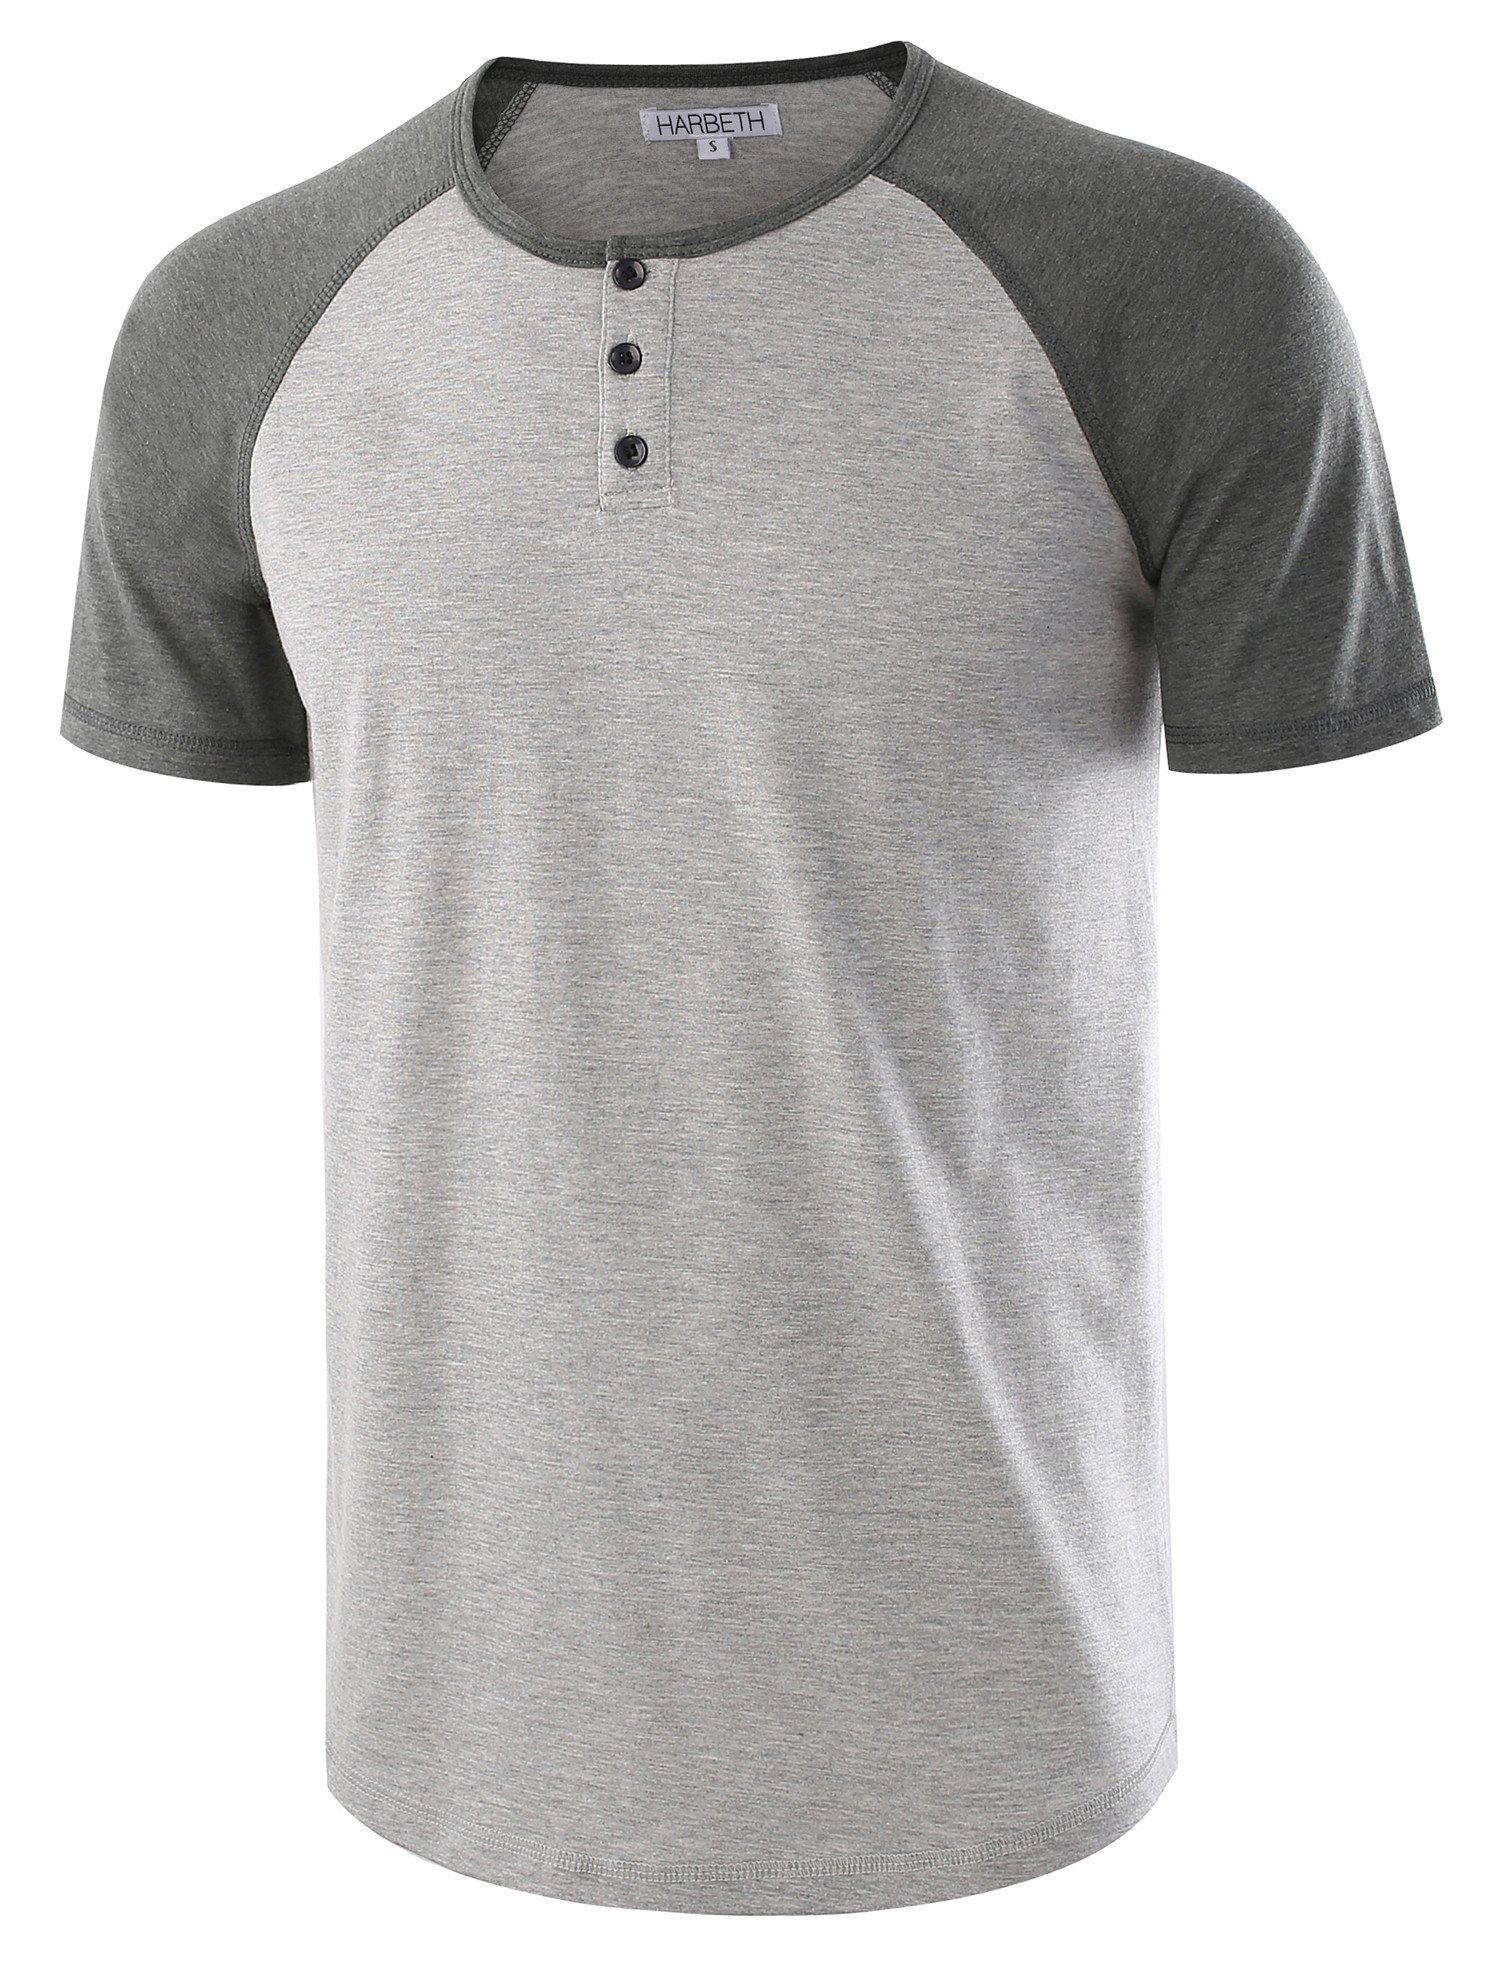 HARBETH Men's Casual Short Sleeve Henley Shirt Raglan Fit Baseball T-Shirts Tee H.Gray/S.Green L by HARBETH